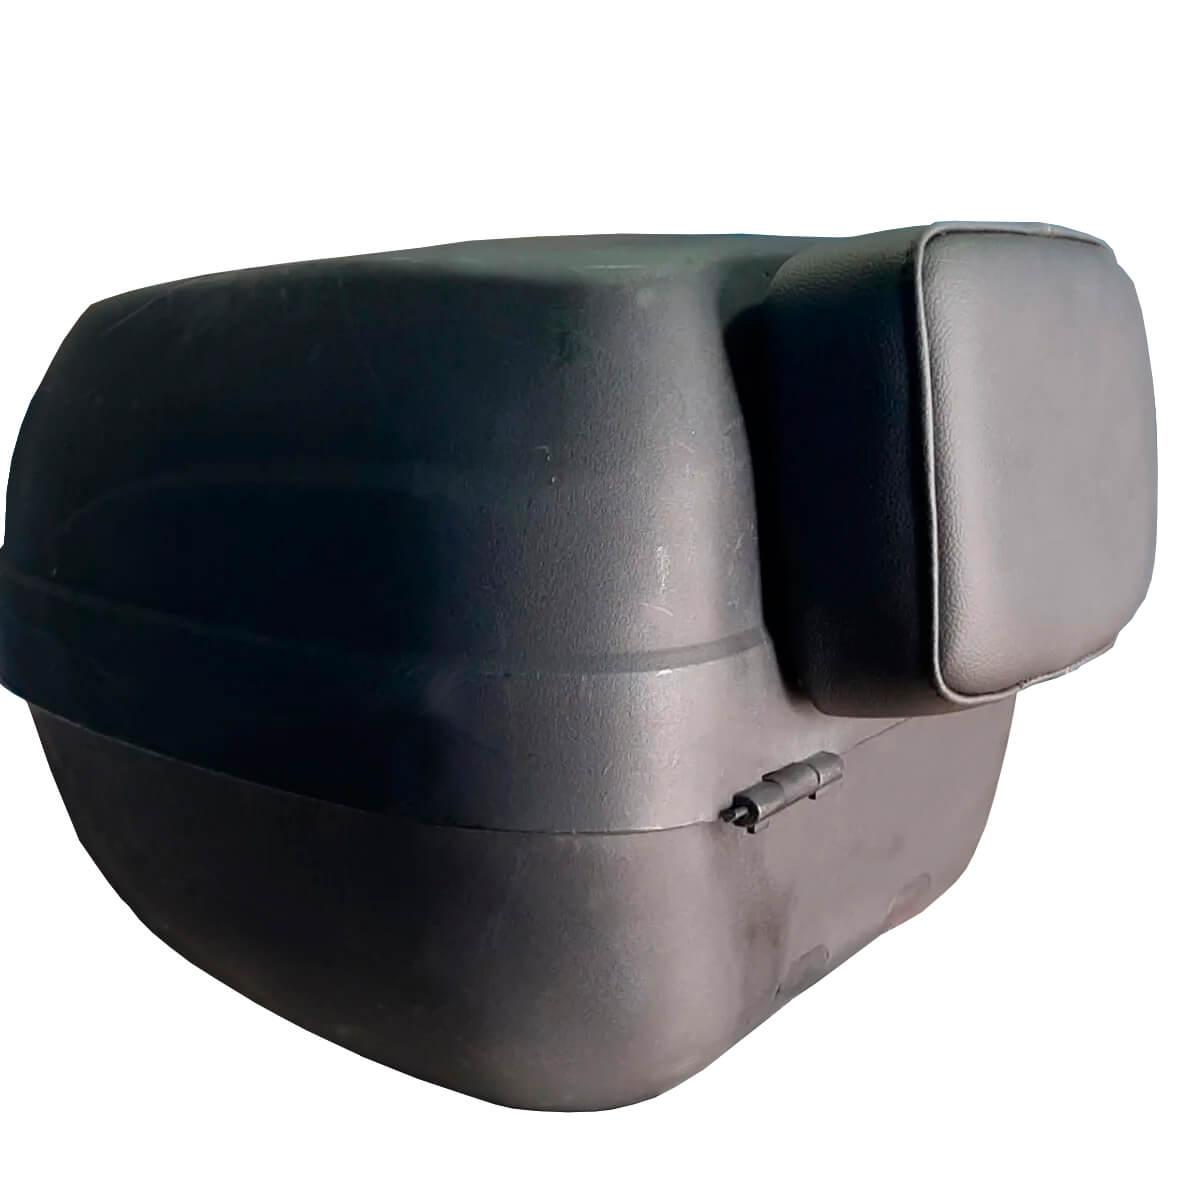 Encosto Pequeno Para Baú Bauleto Universal - 005-795-AT